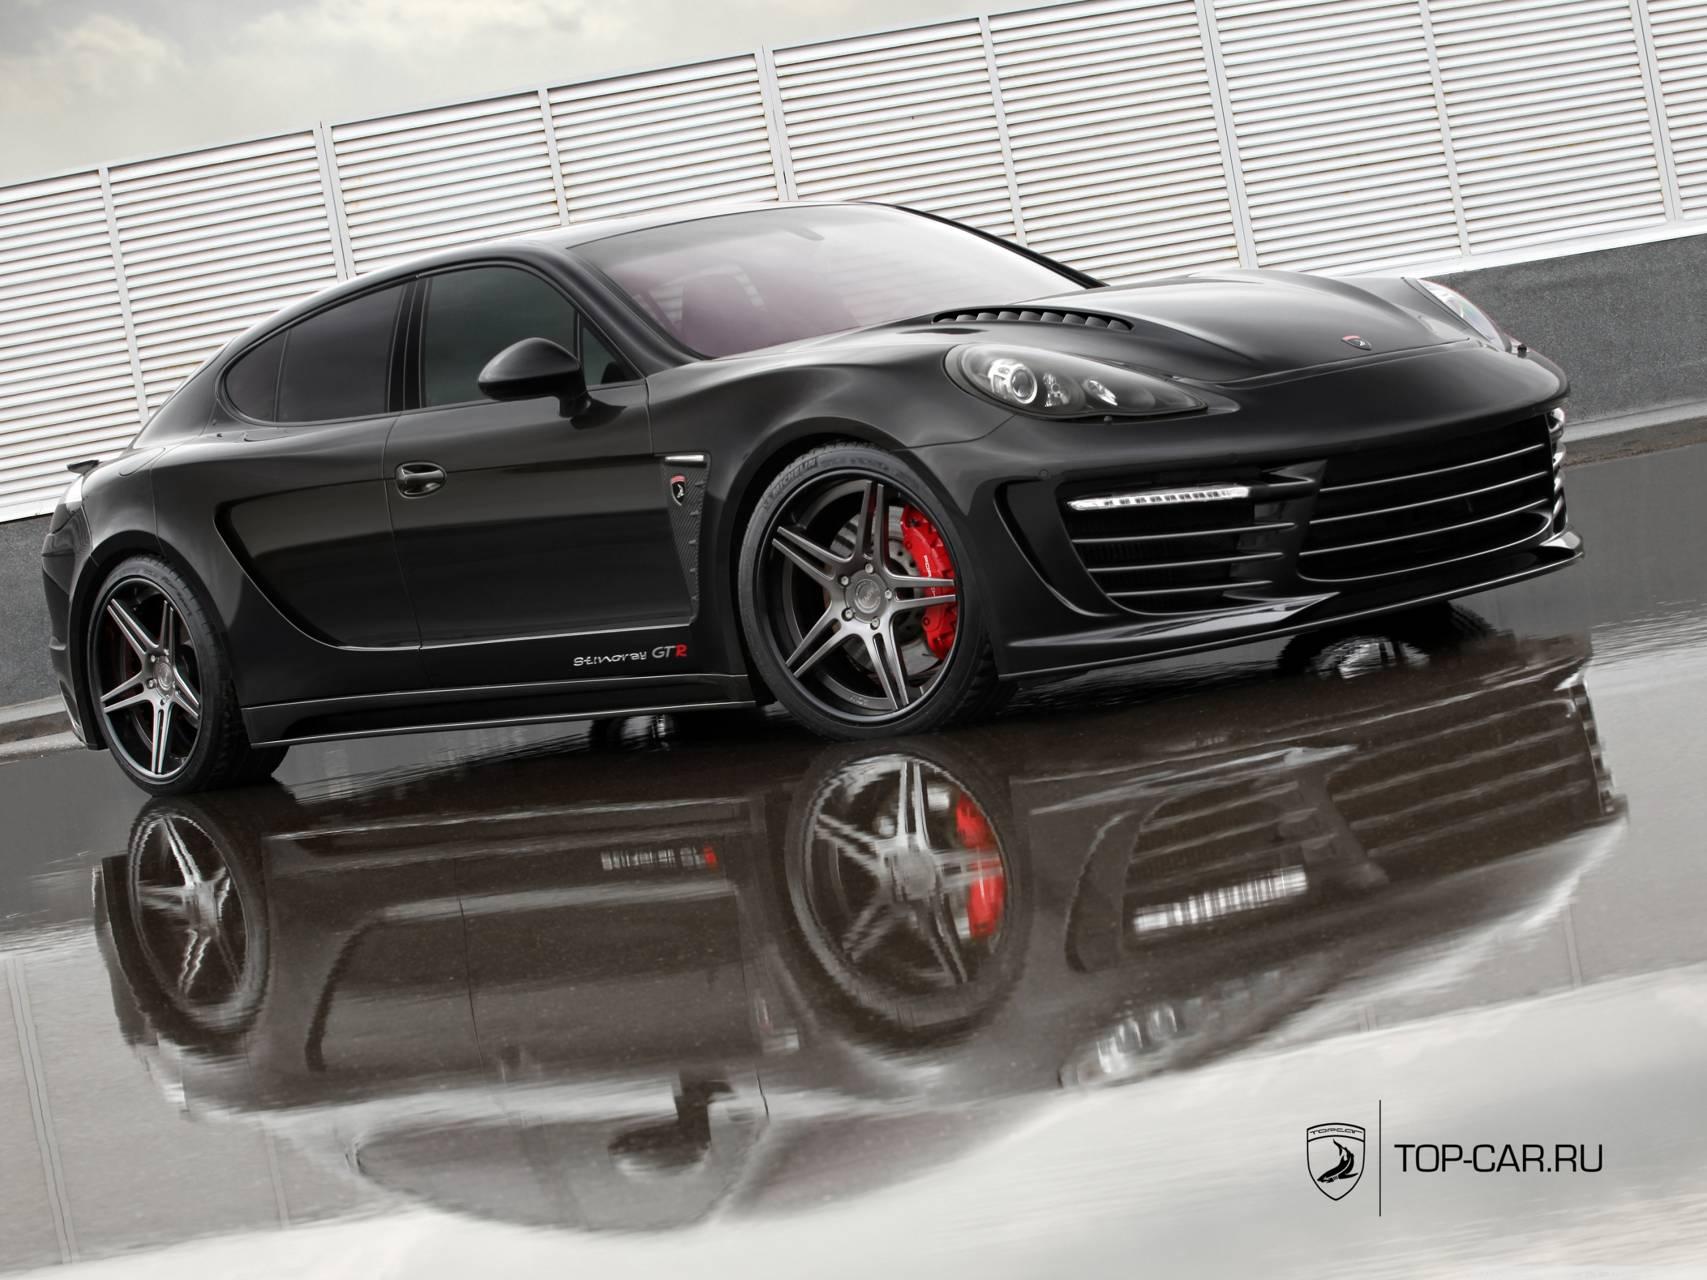 Porsche Panarema Tun